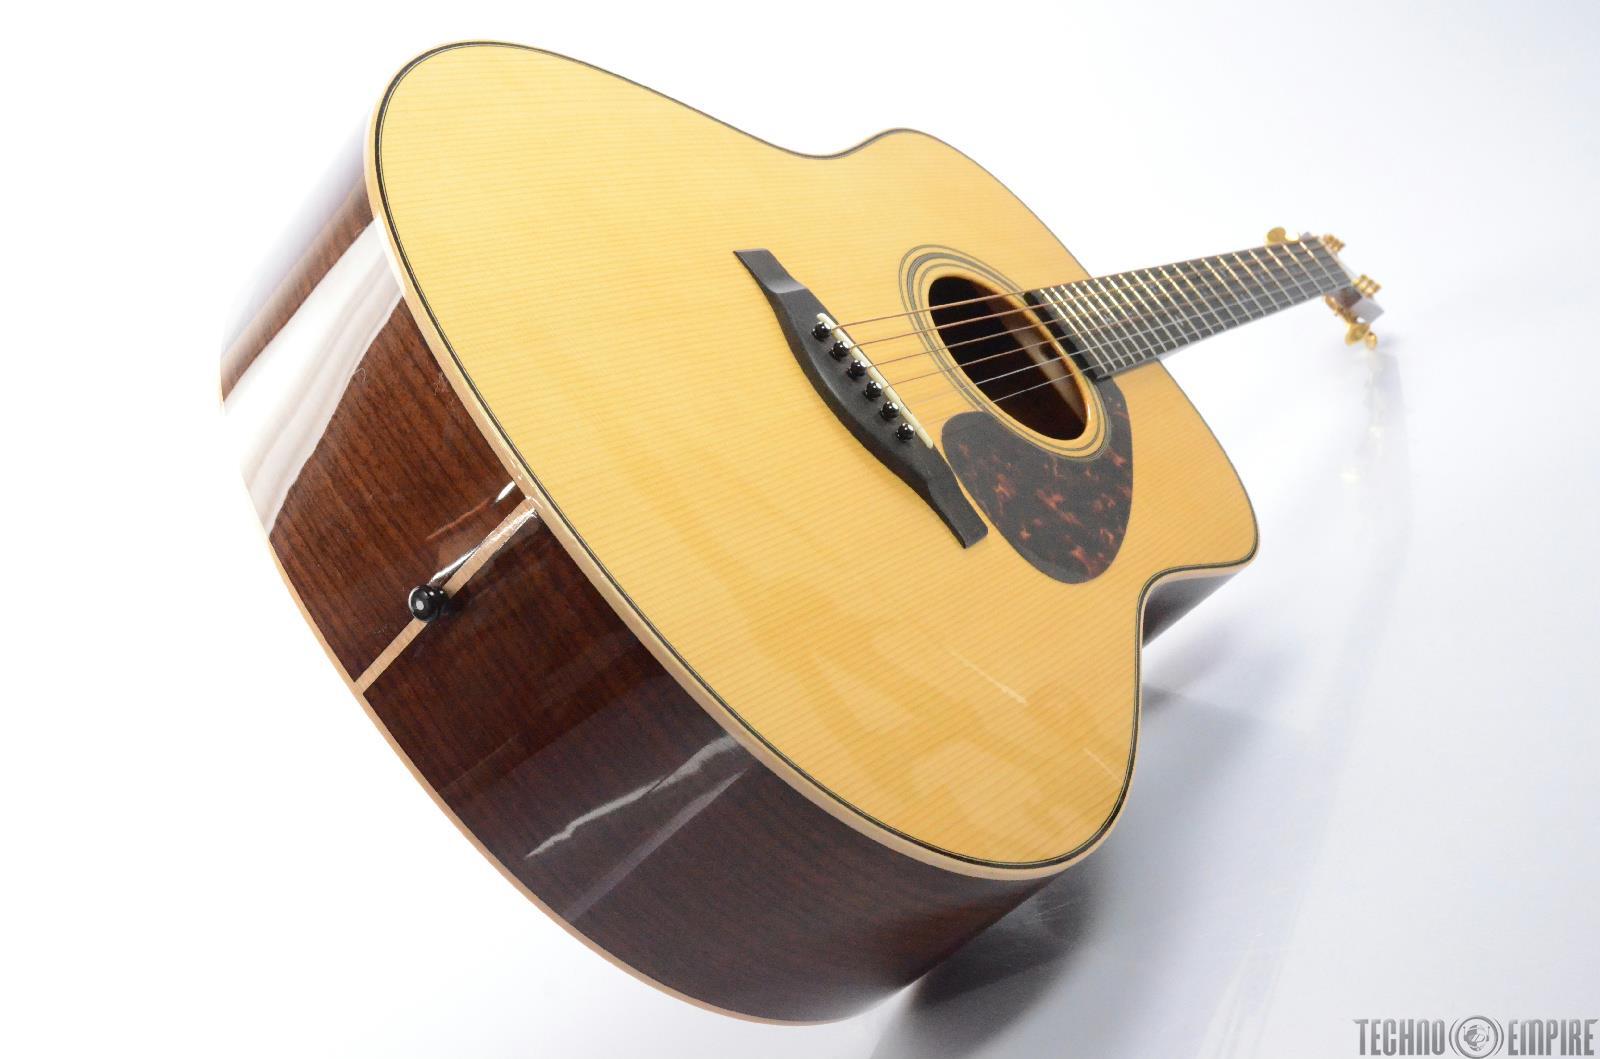 Yamaha ll26 l series acoustic guitar with hard case 28226 for Yamaha acoustic guitar ebay